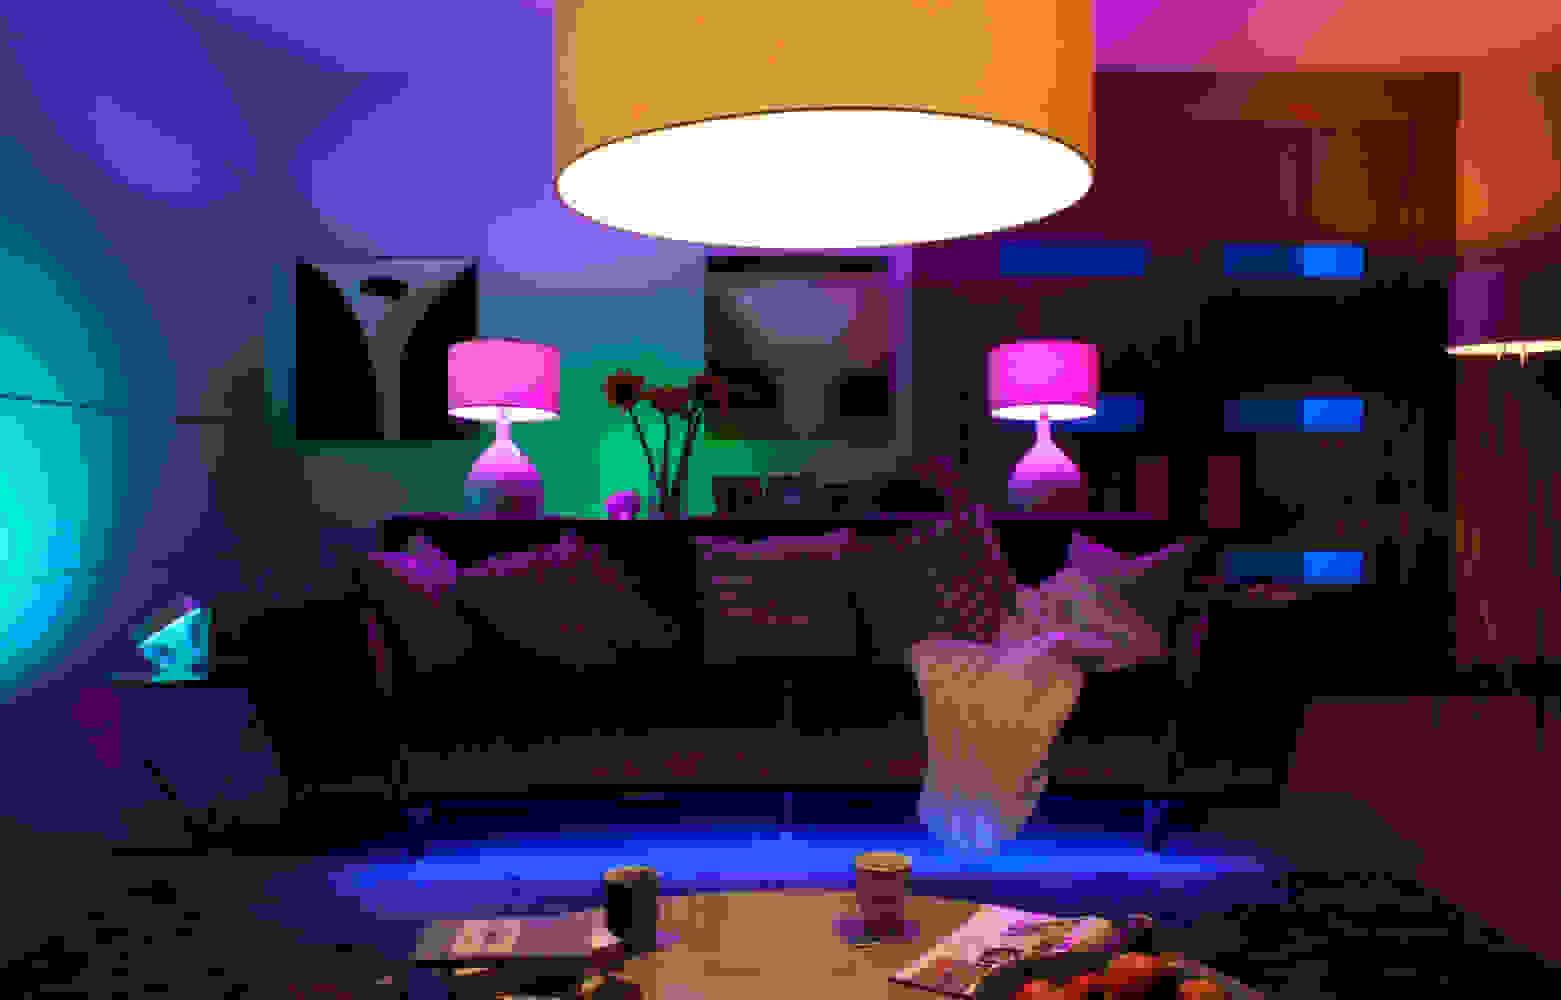 Coloured mood lighting | Source: litecraft.co.uk